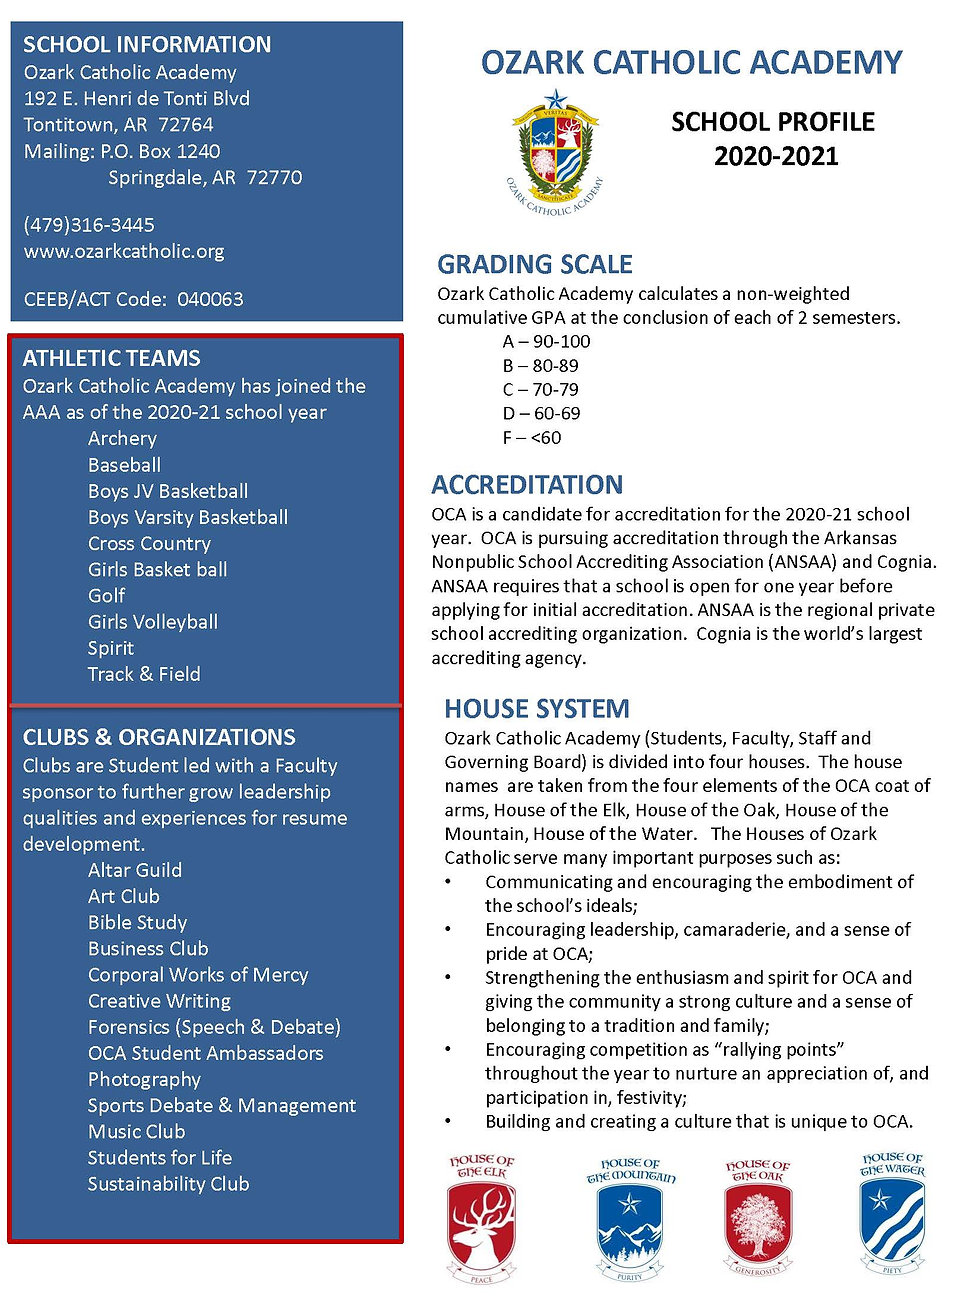 School Profile 2020_21_Page_2.jpg